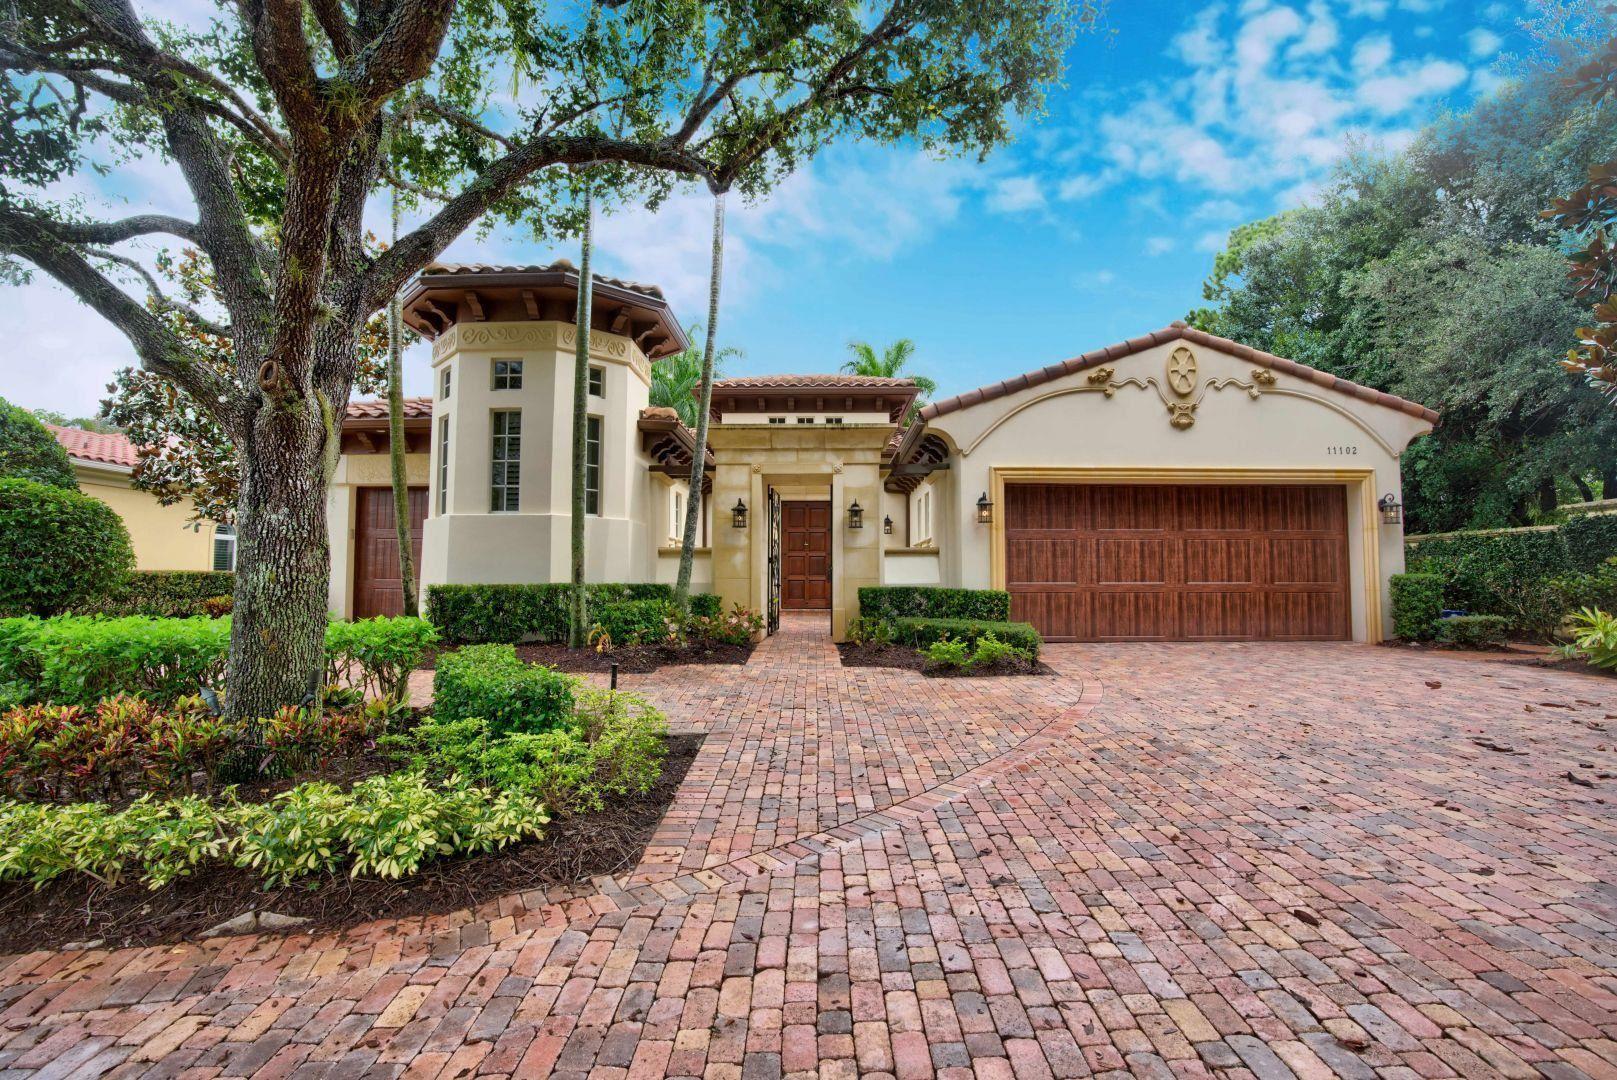 11102 Green Bayberry Drive, Palm Beach Gardens, FL 33418 - #: RX-10628096